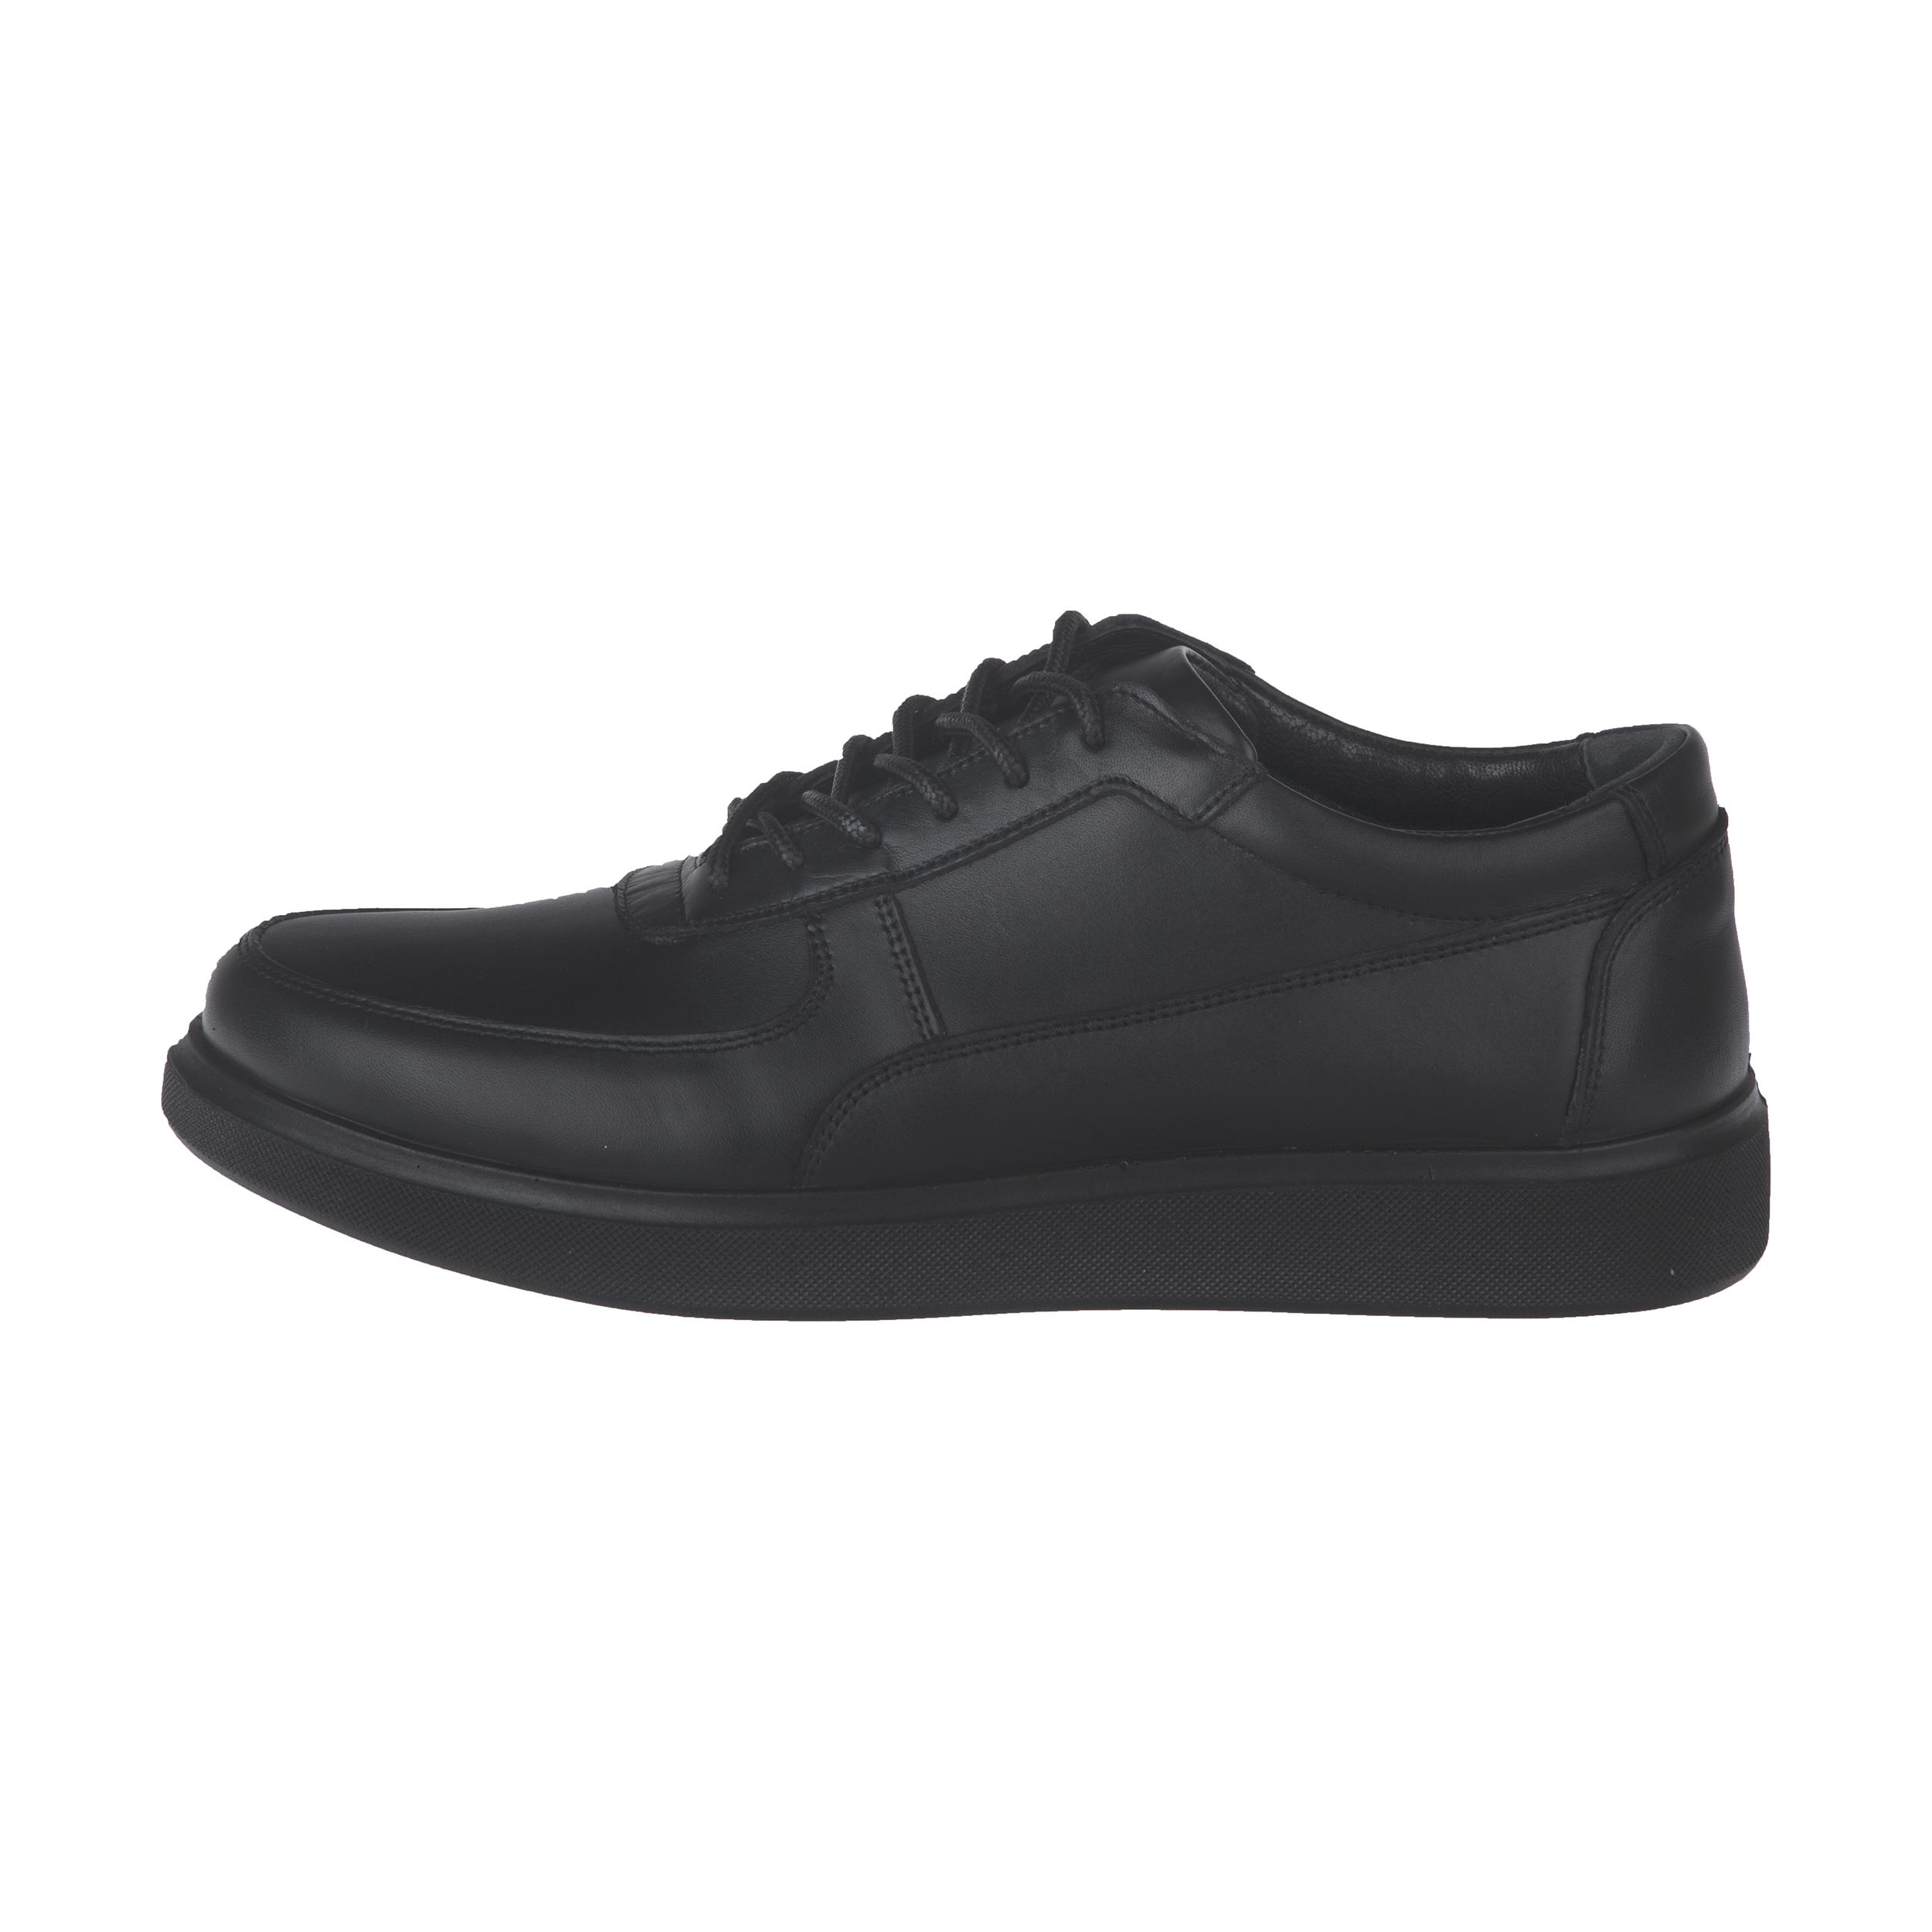 کفش روزمره مردانه گلسار مدل 7011A503101